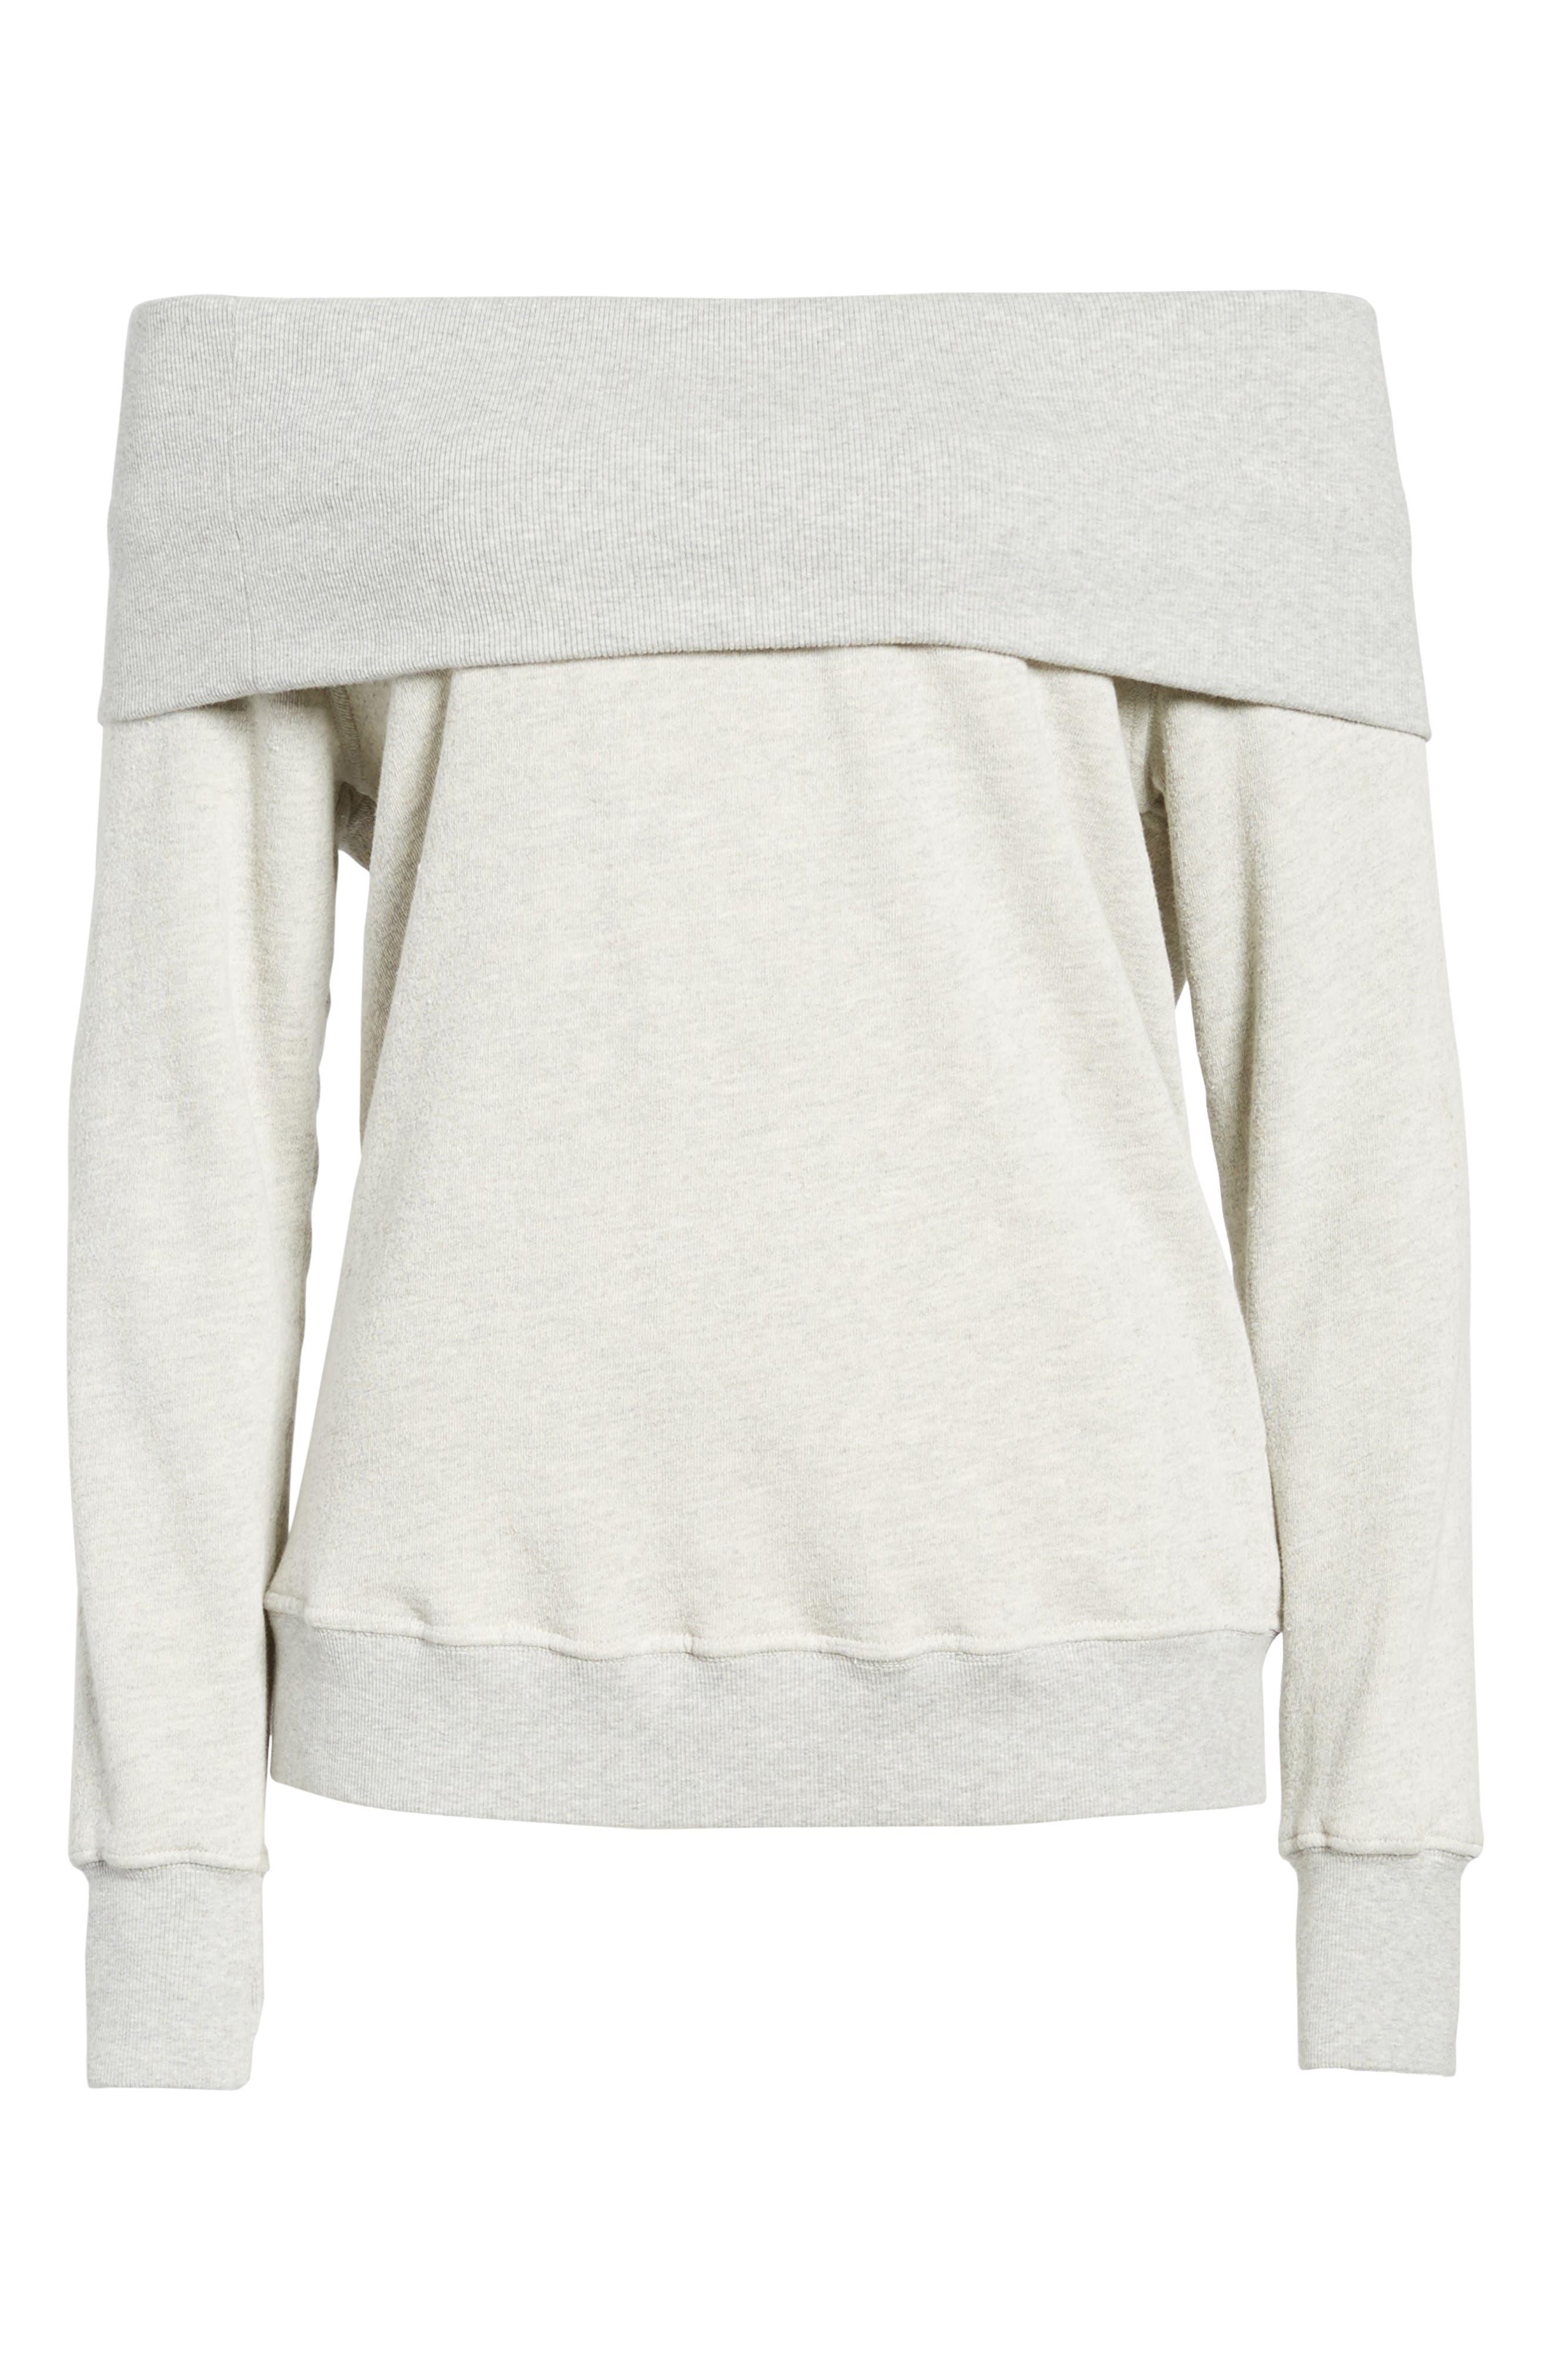 Off the Shoulder Sweatshirt,                             Alternate thumbnail 6, color,                             031